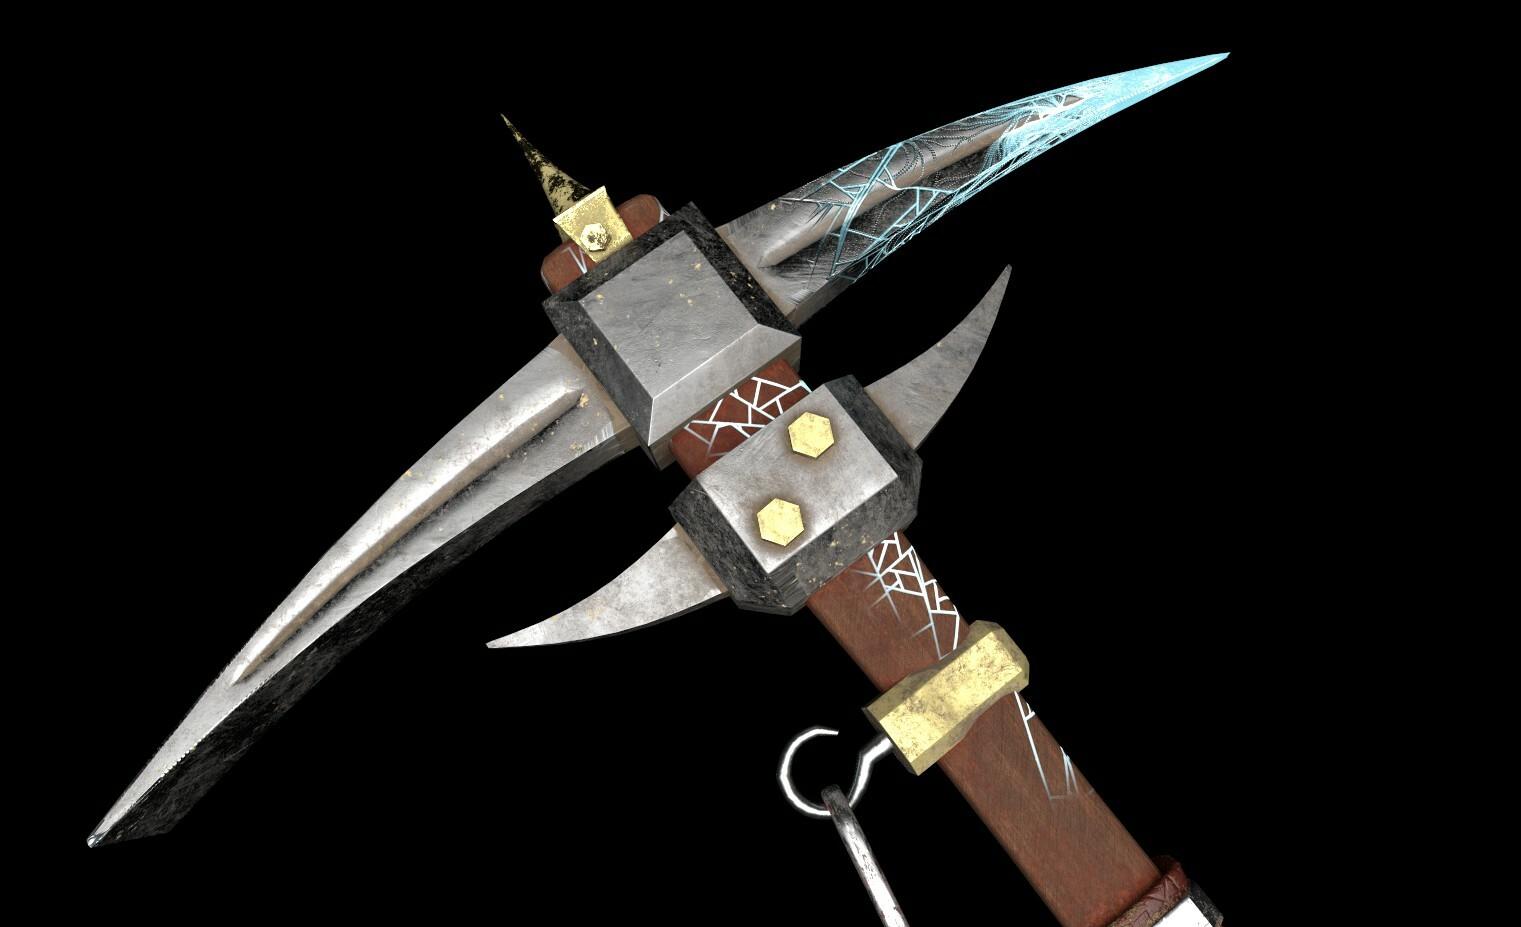 Alex Gaston - Tempest Thunder Crack - Magic Fantasy Pickaxe